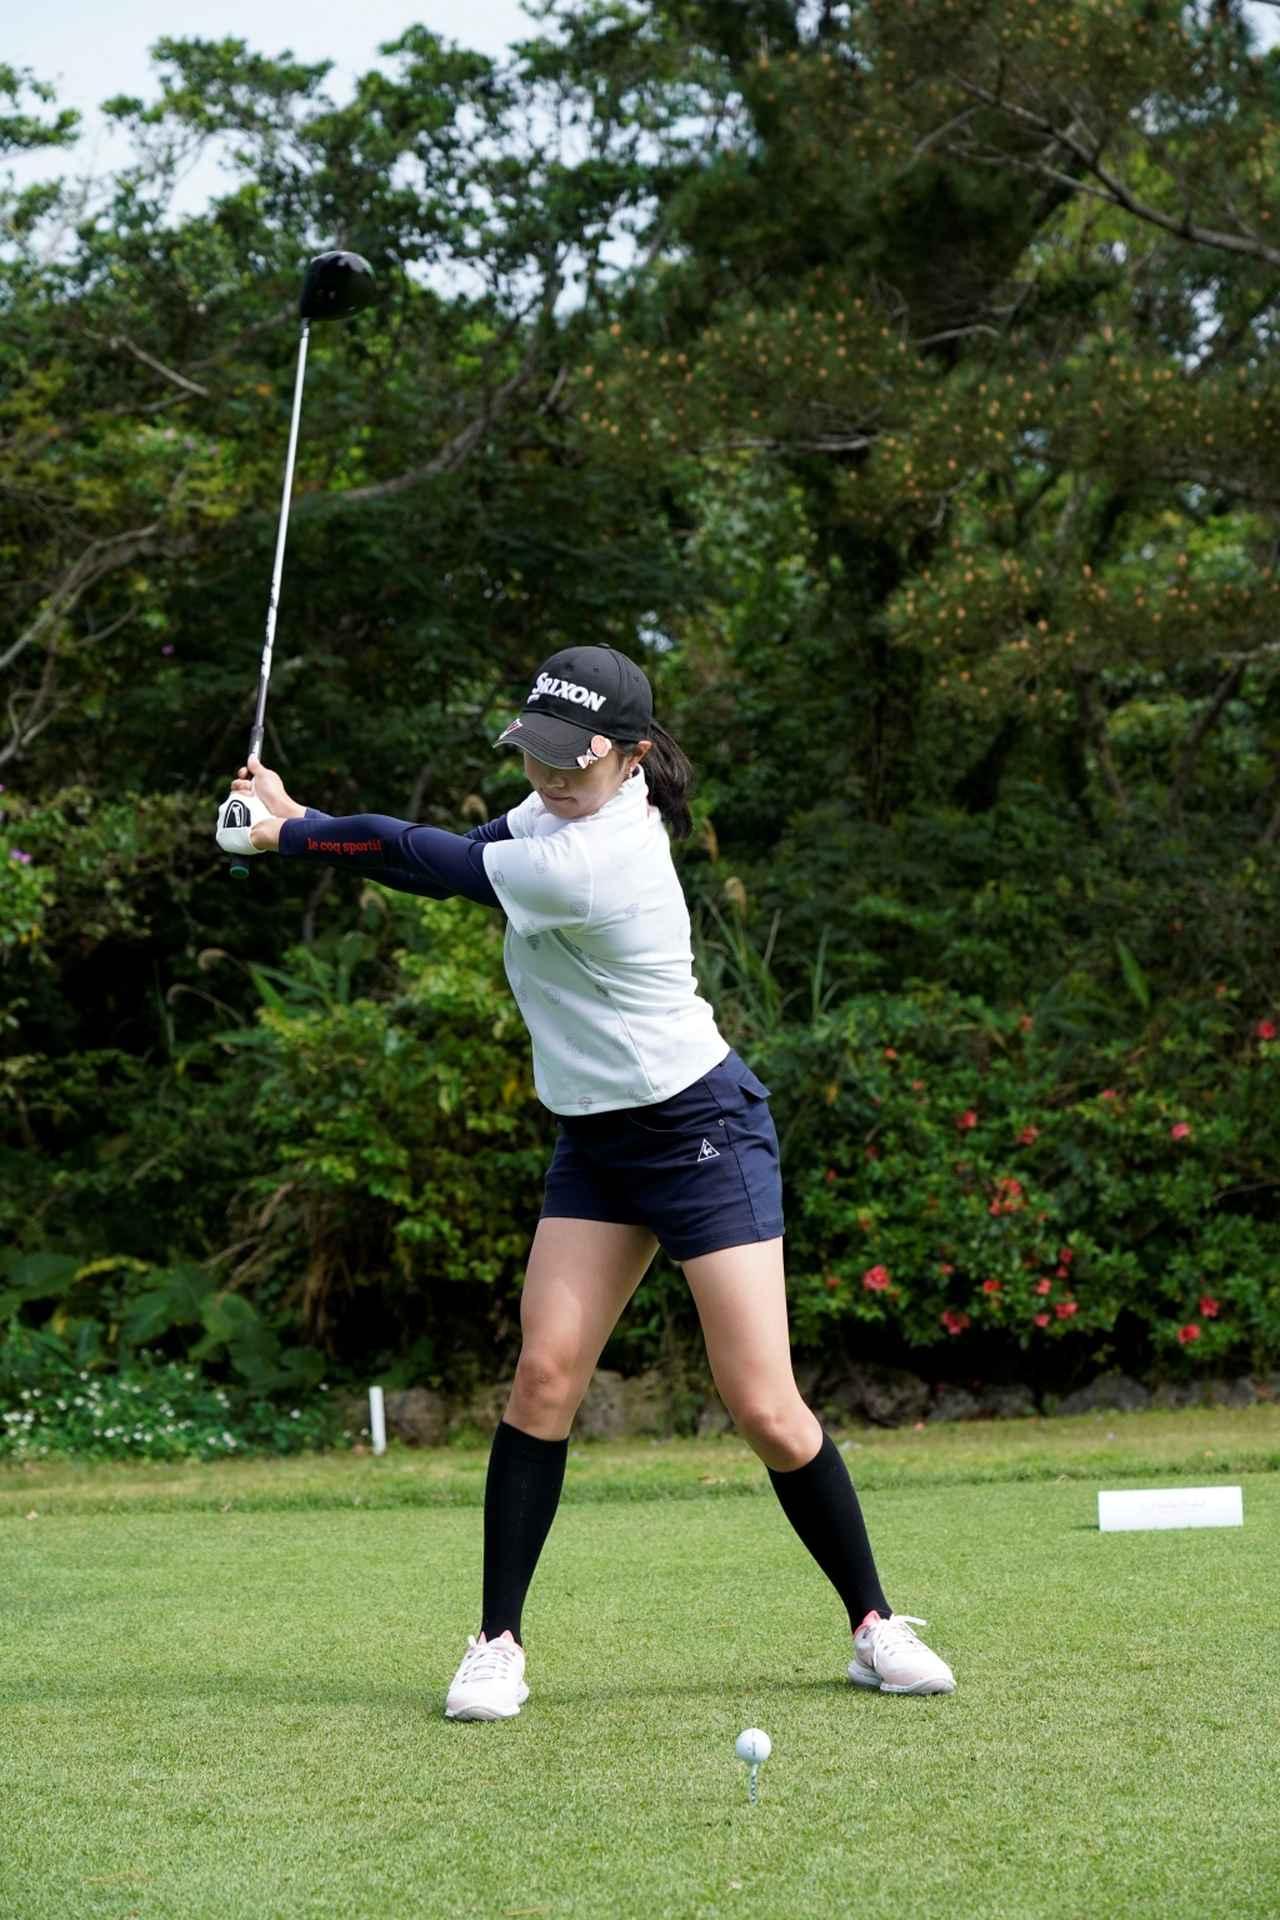 Images : 7番目の画像 - 三浦桃香のドライバー連続写真 - みんなのゴルフダイジェスト